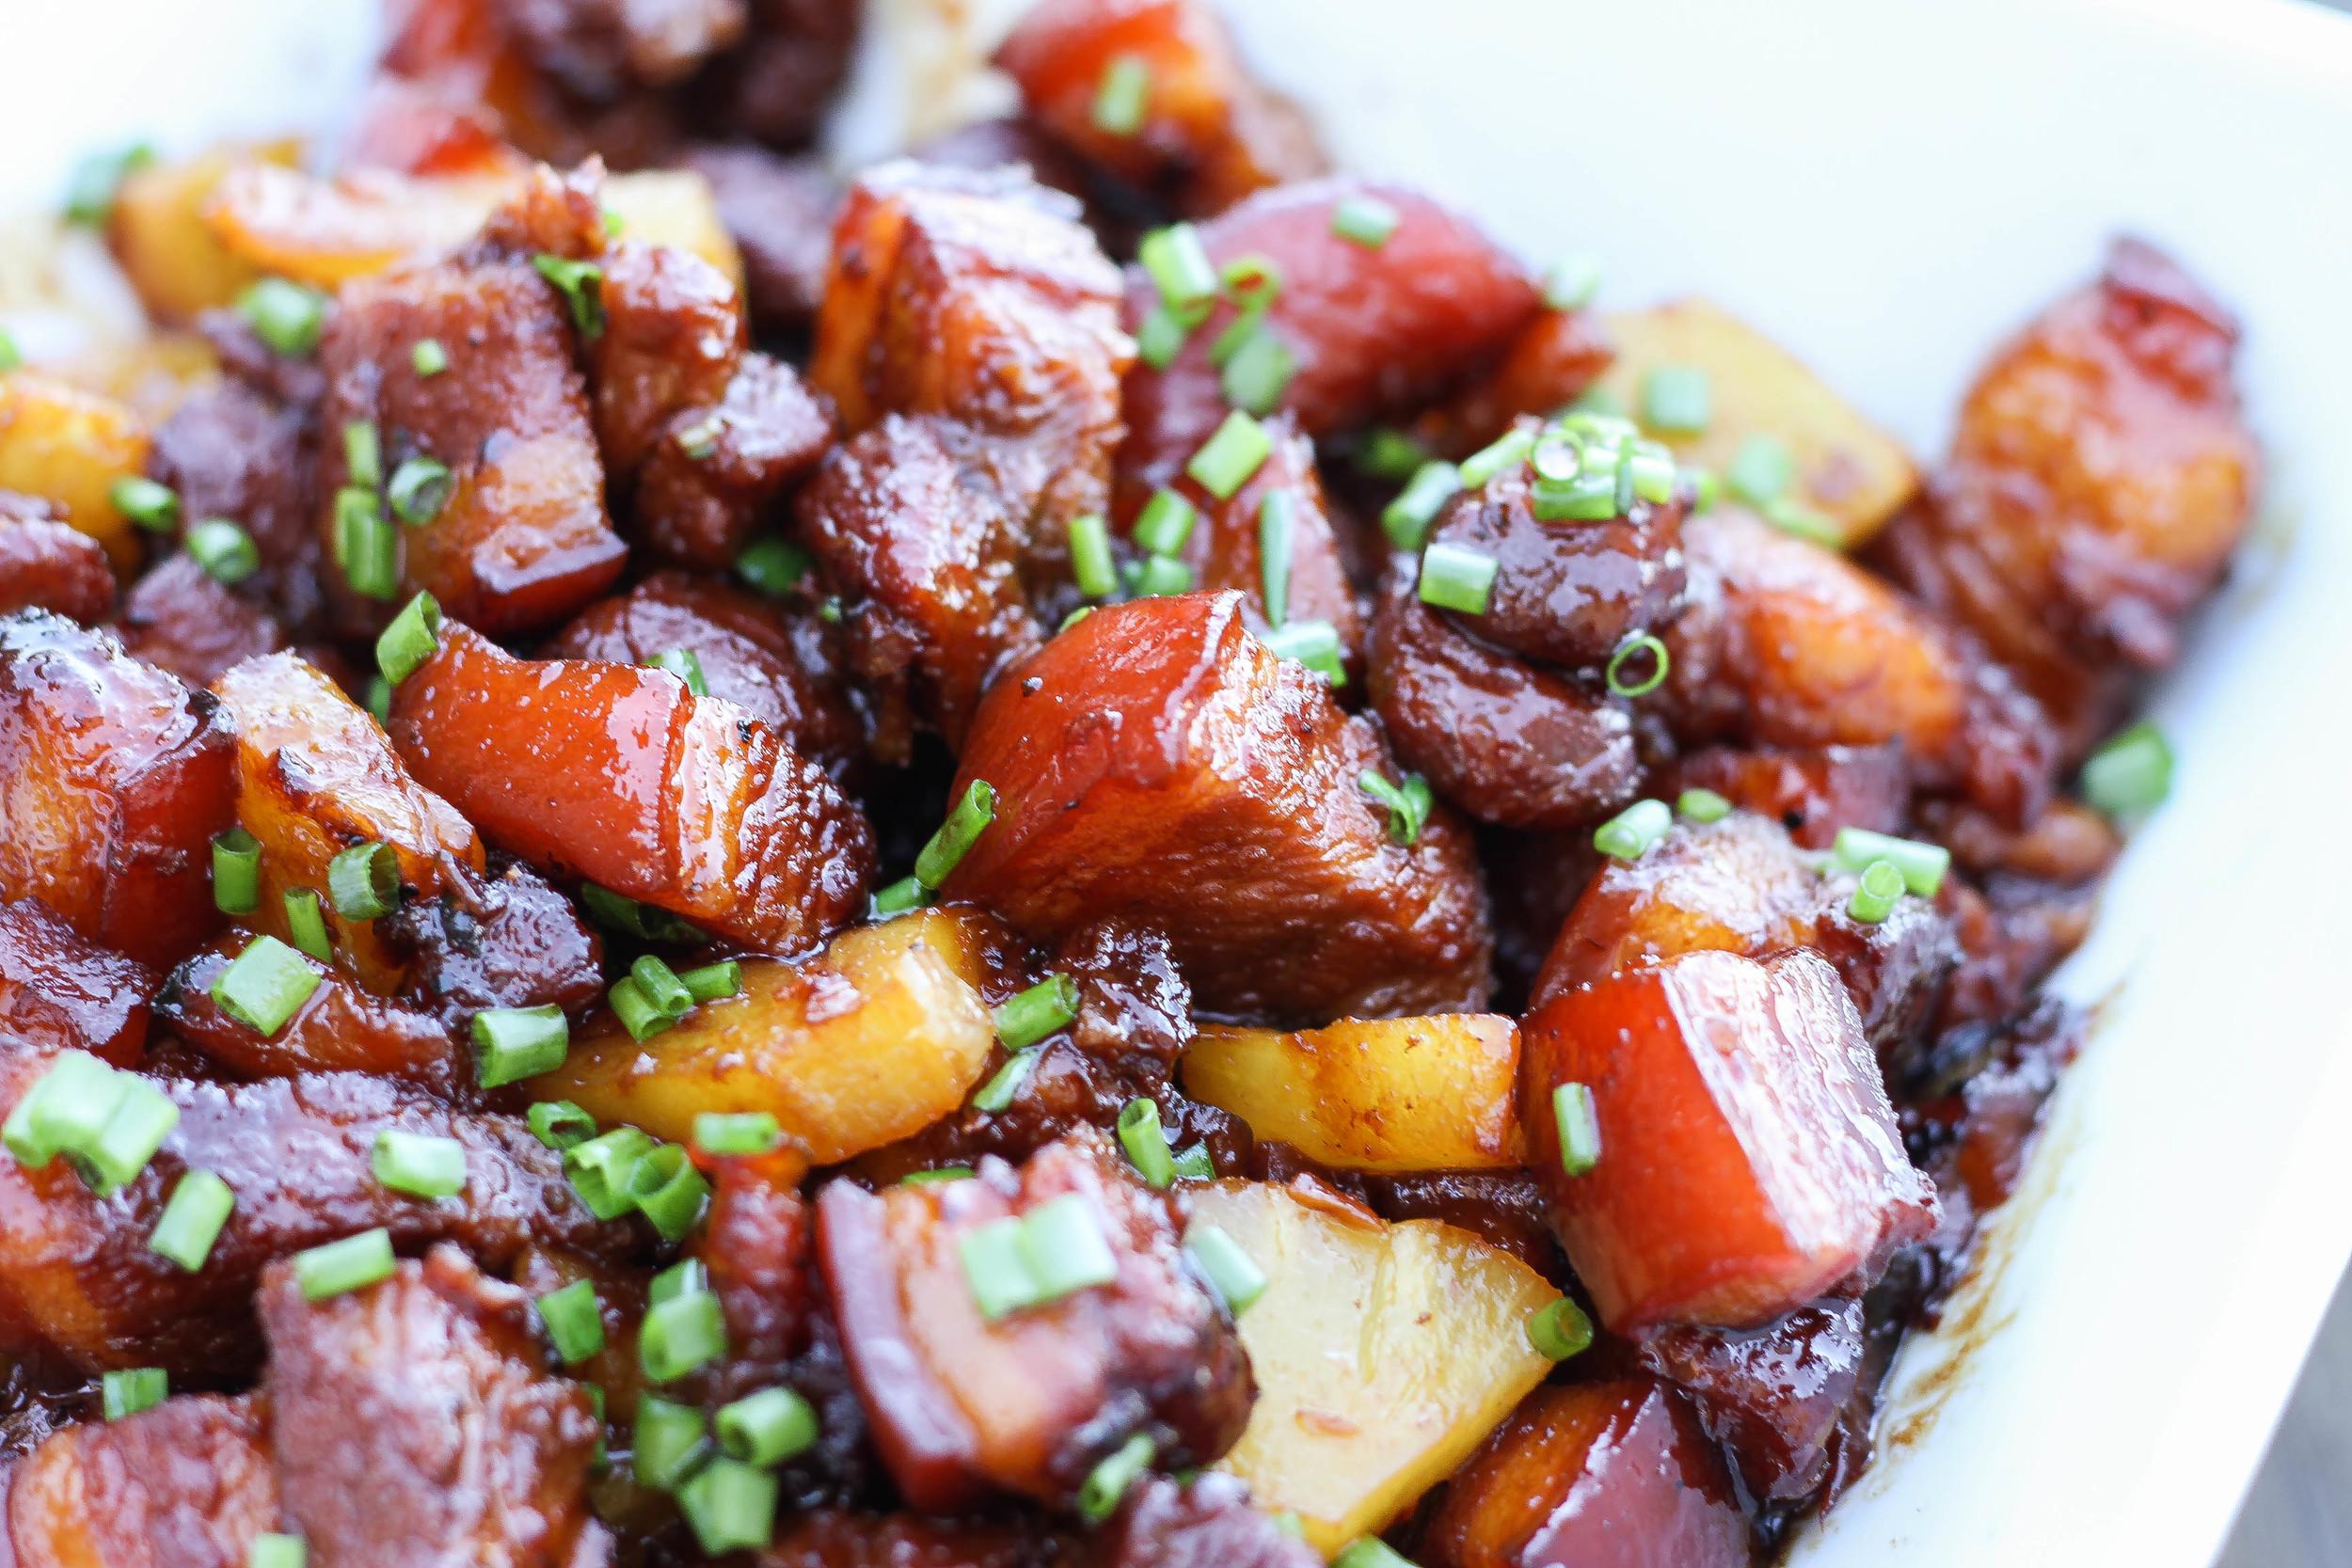 Vietnamese Braised Pork and Pineapple Thit Kho Thom